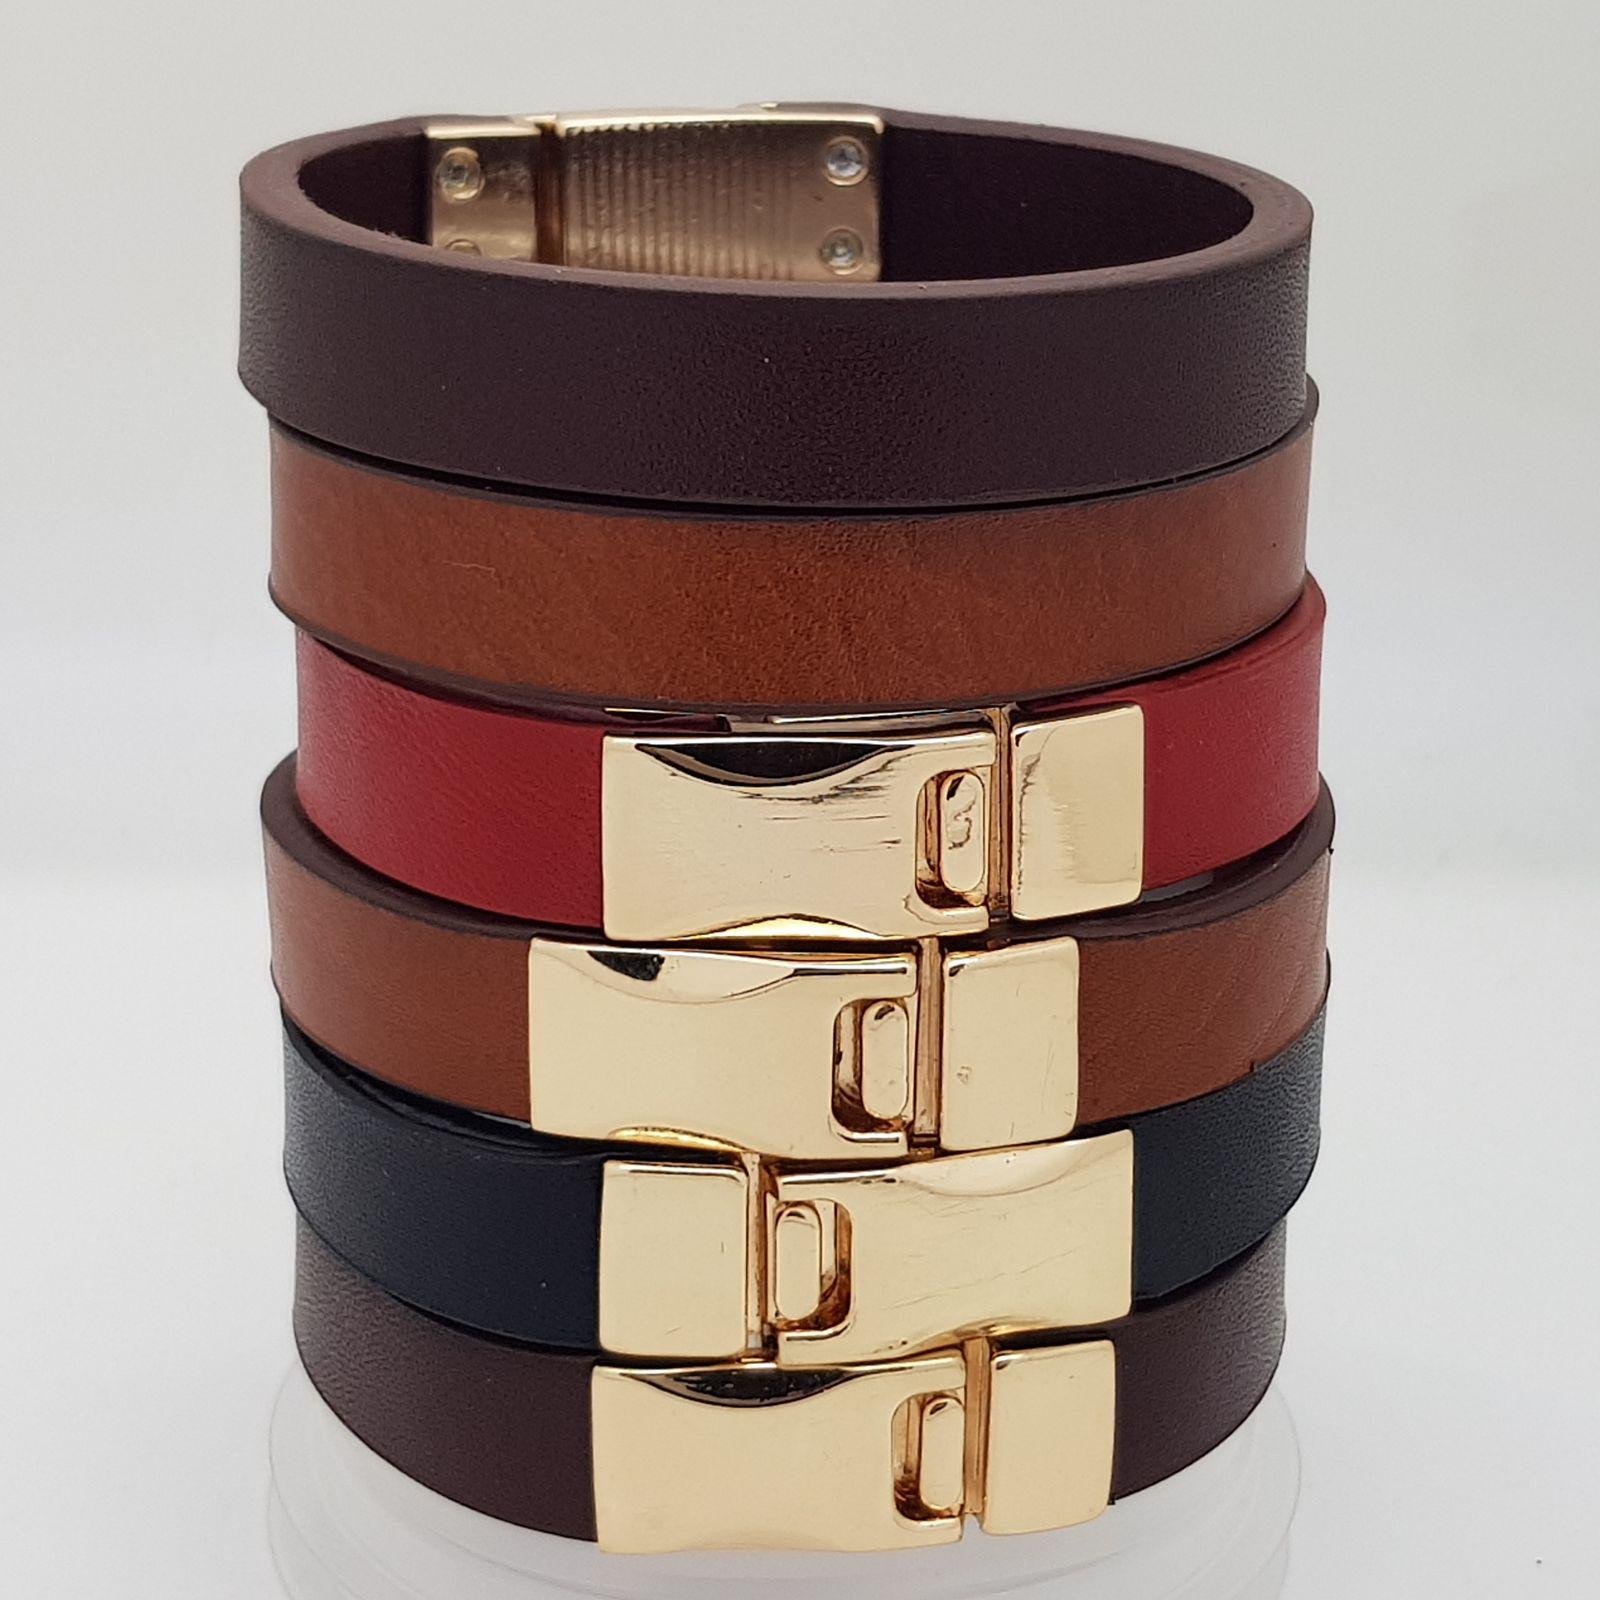 دستبند کد ۱۲۰ thumb 2 2